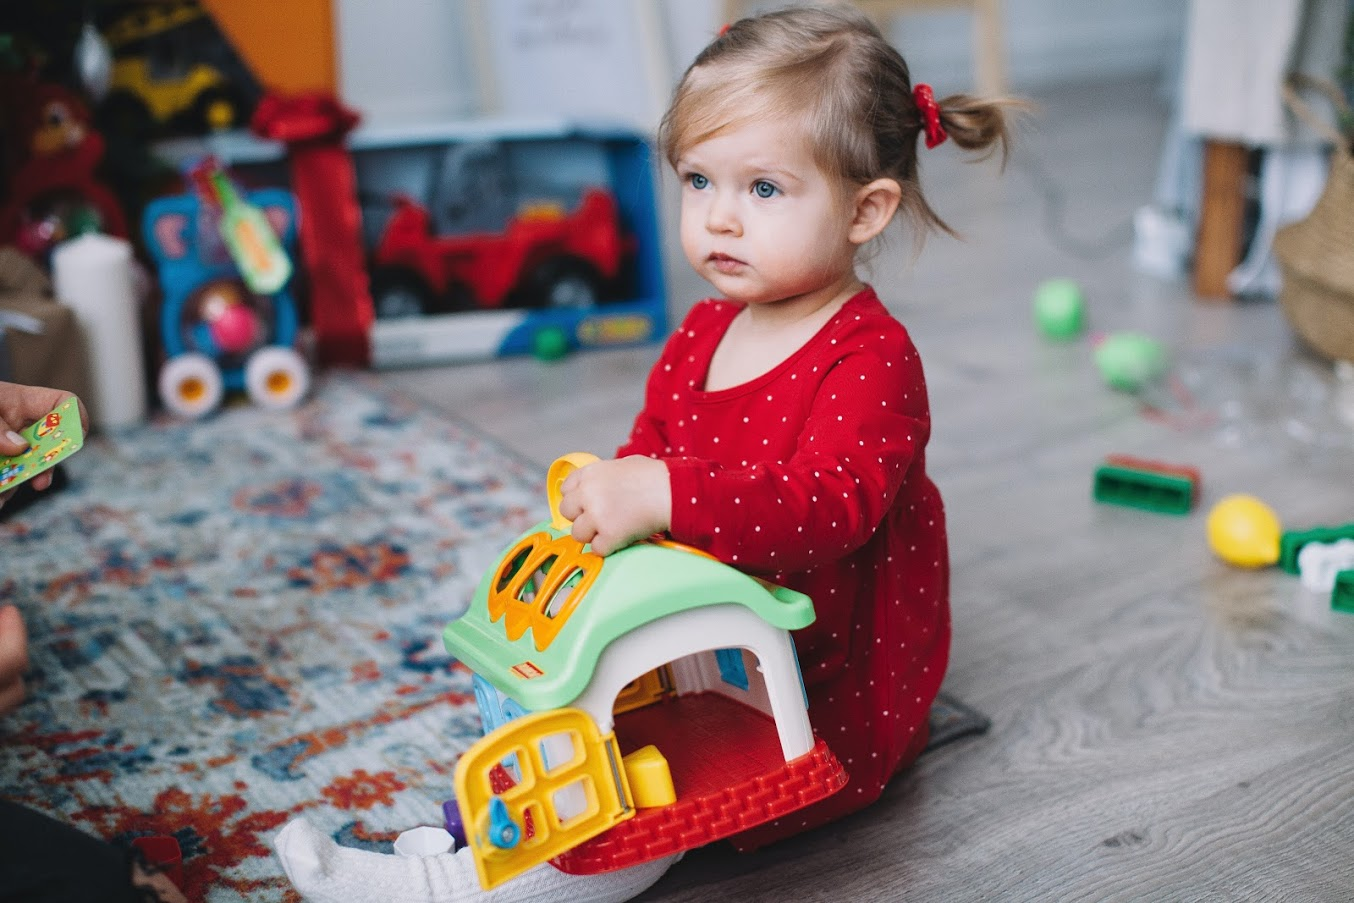 Dl Sostegni bonus famiglie 2021 - Foto di Polesie Toys da Pexels